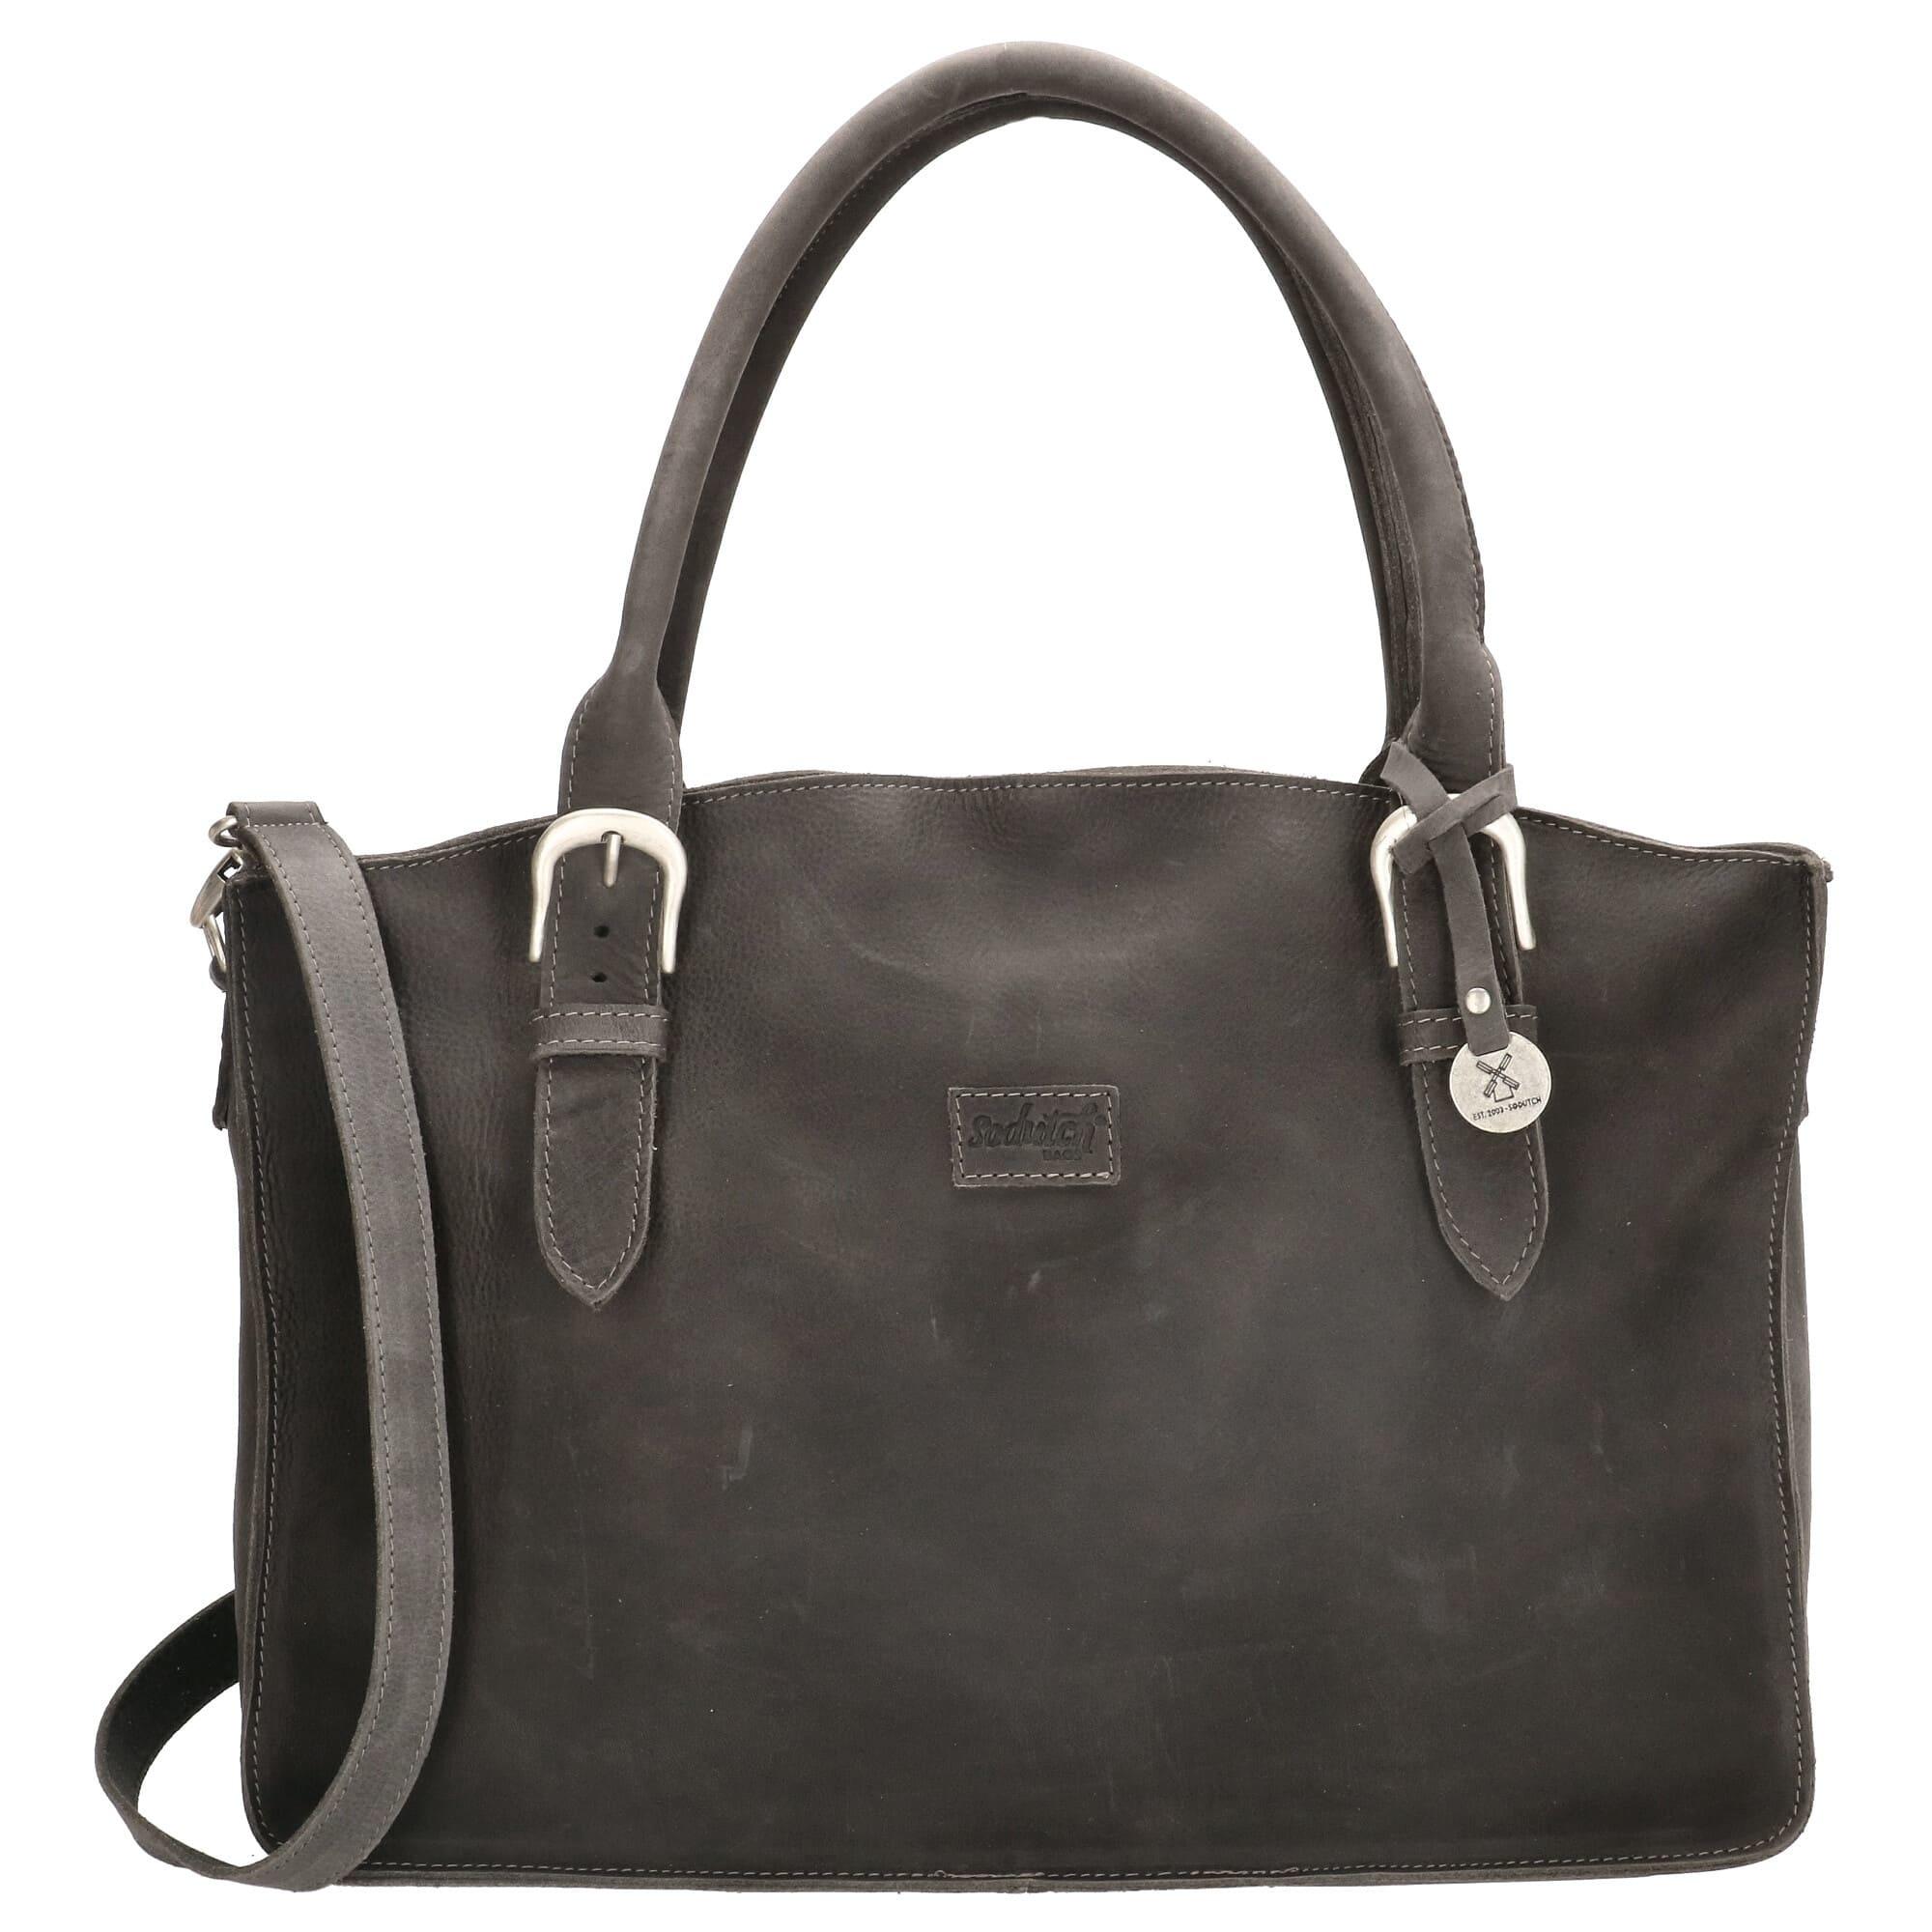 SoDutch Bags Laptoptas #09 Donker Grijs